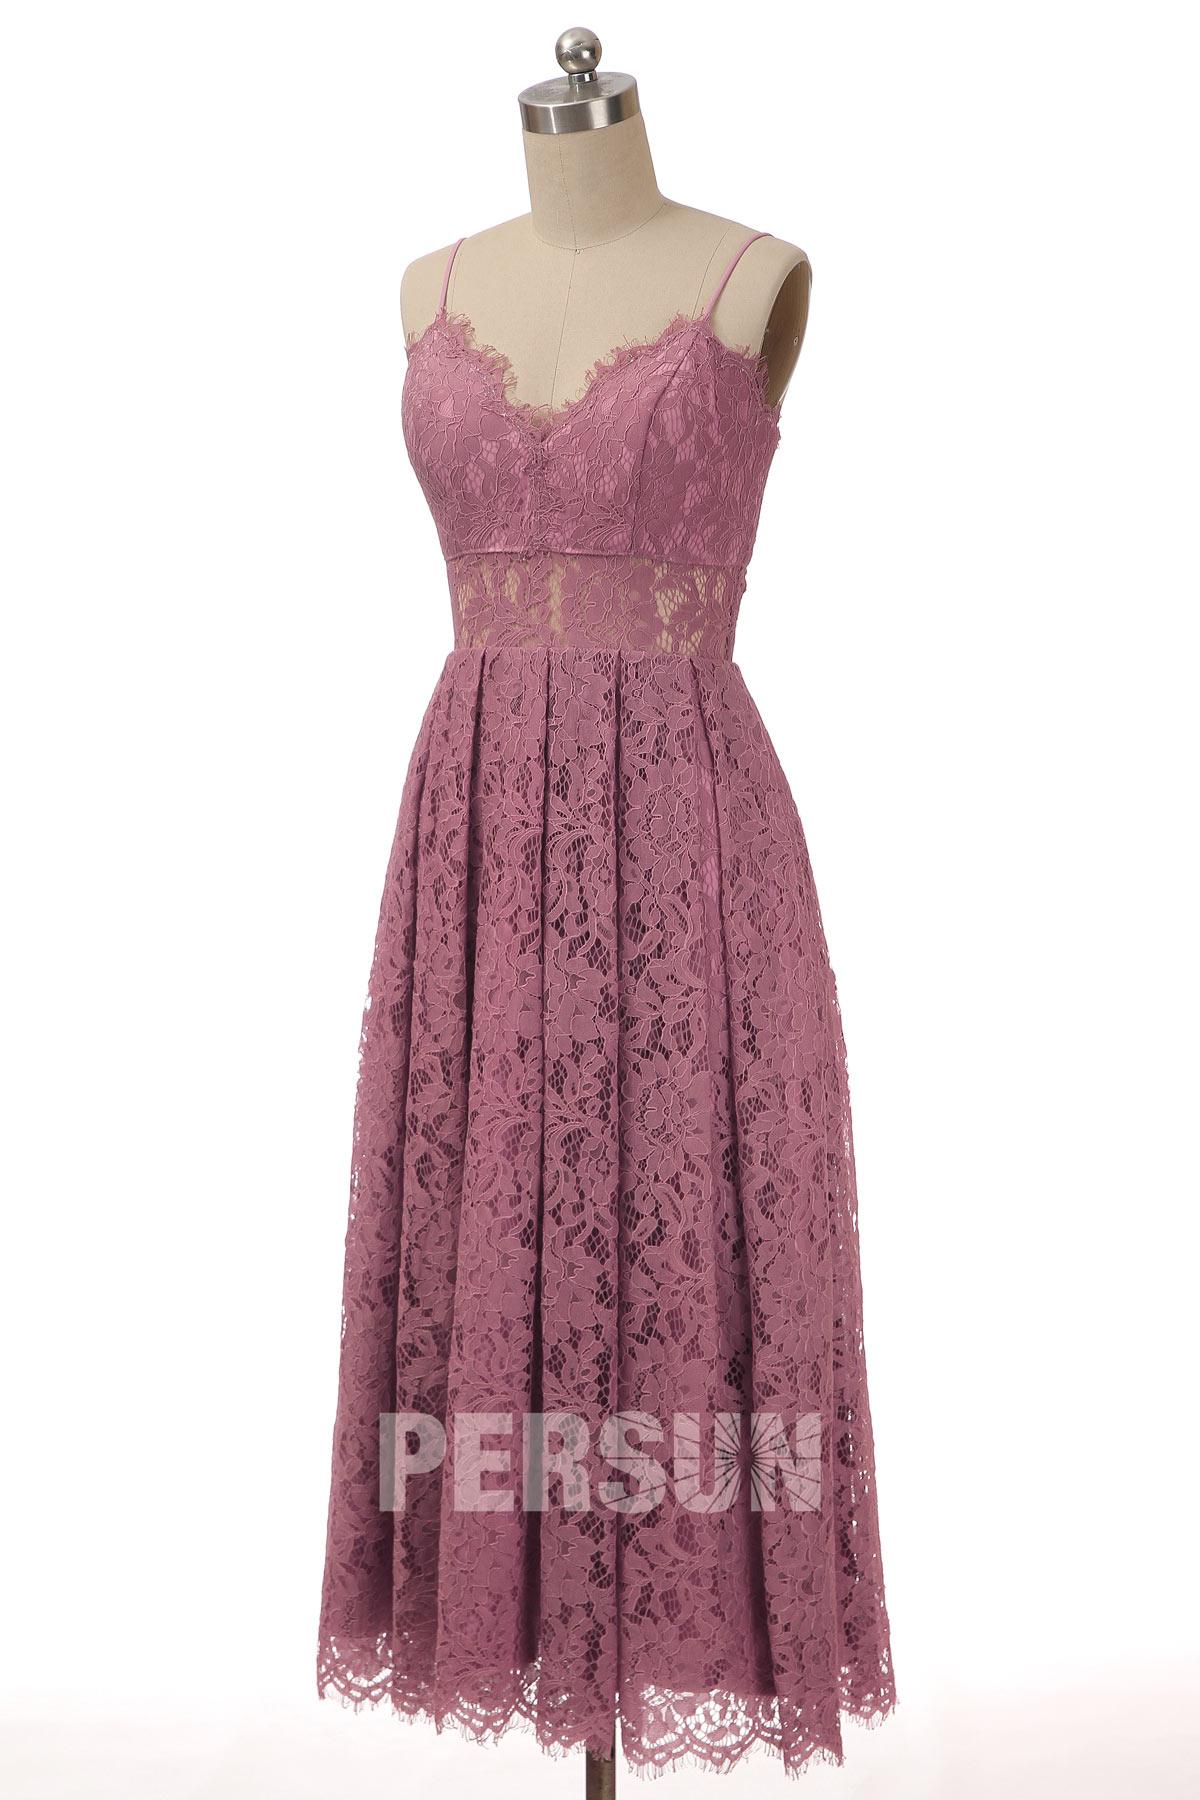 robe demoiselle honneur mi-longue rose en dentelle col v à bretelle fine taille transparente